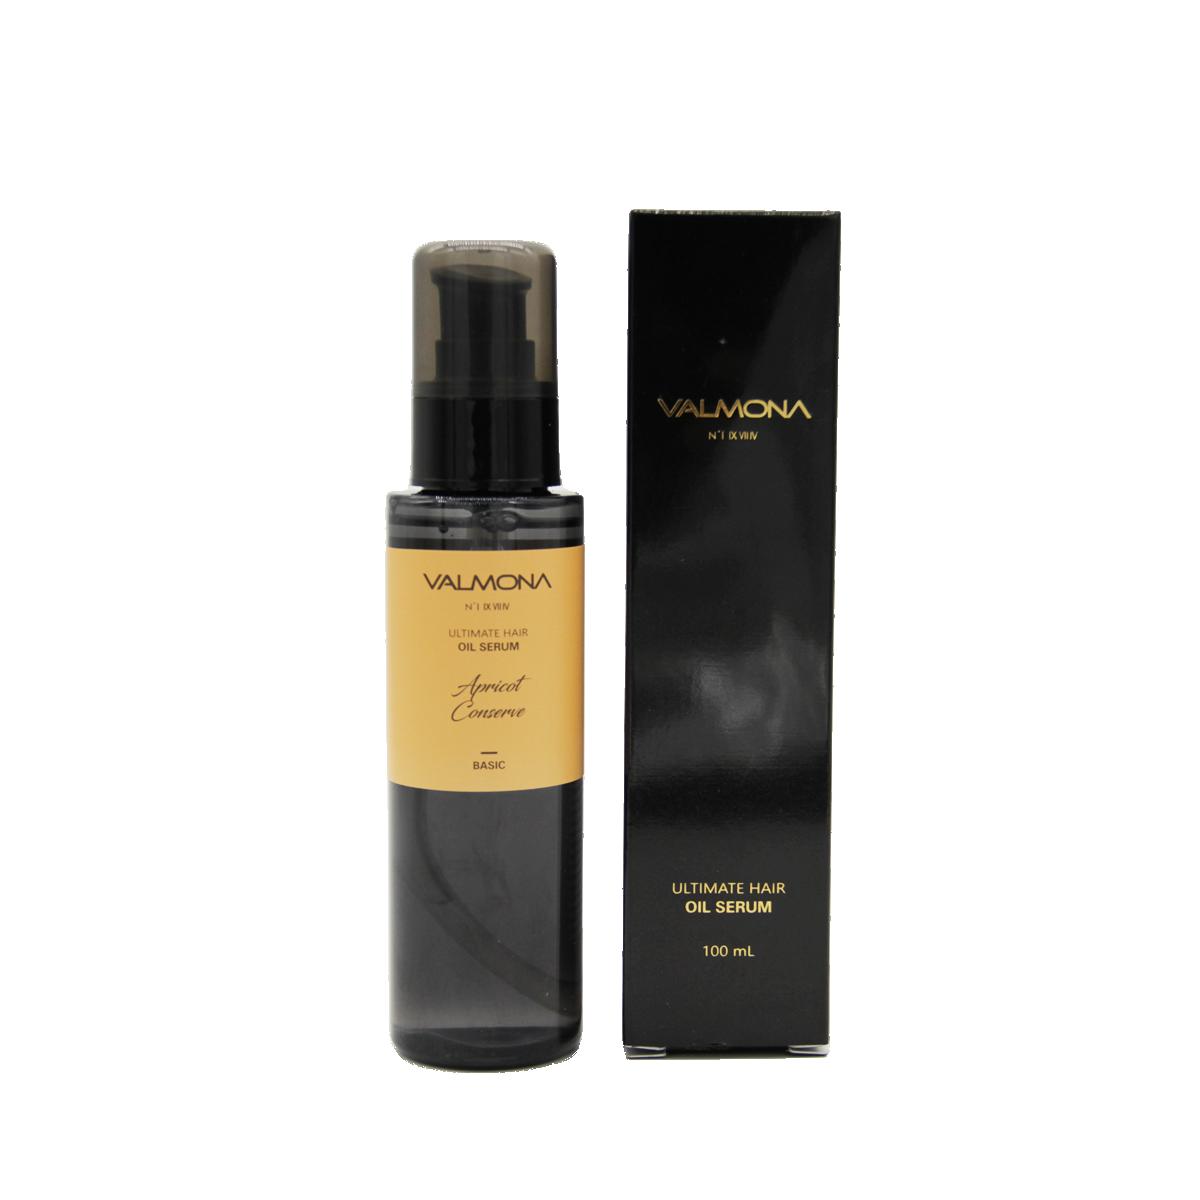 Valmona Ultimate Hair Oil Serum Apricot